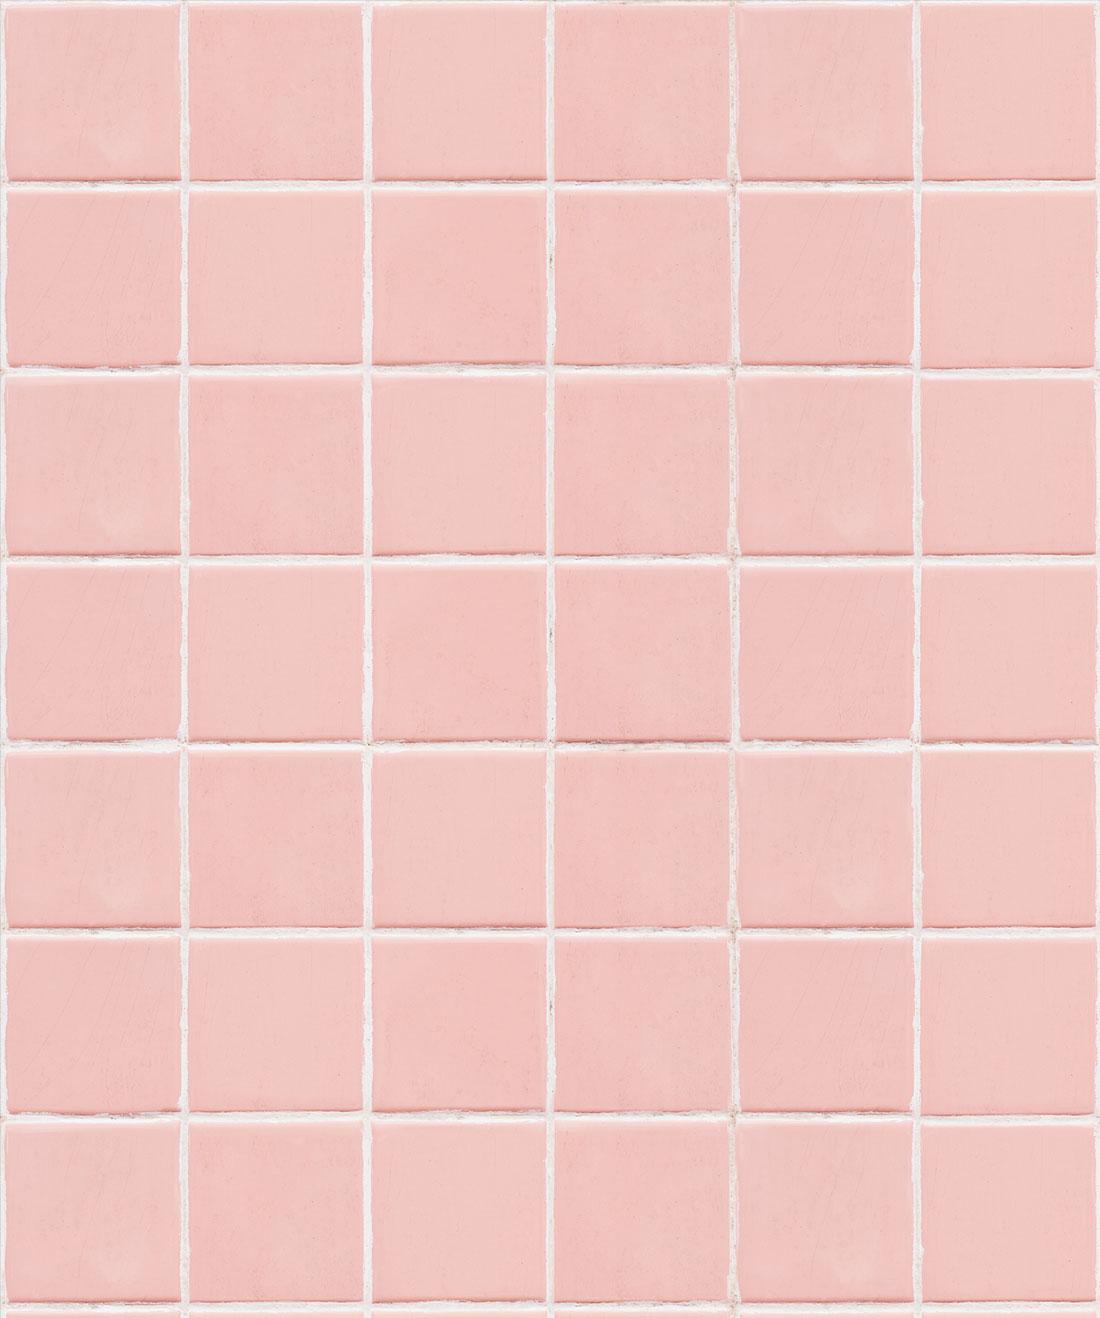 Pink Tiles Wallpaper